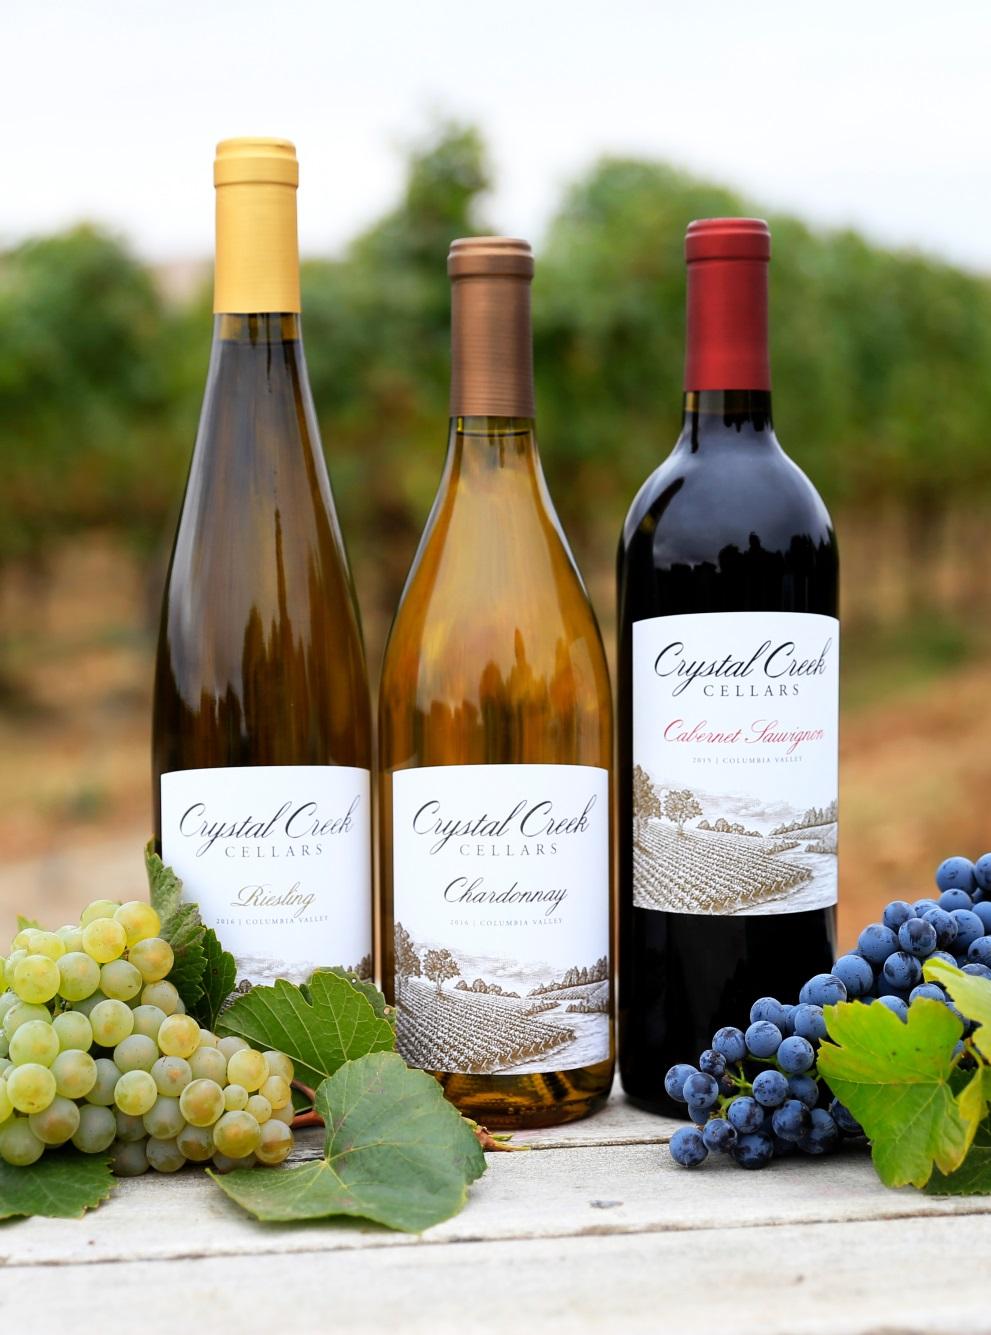 Three varieties of Crystal Creek Cellars beverages including Risling, Chardonnay and Cabernet.